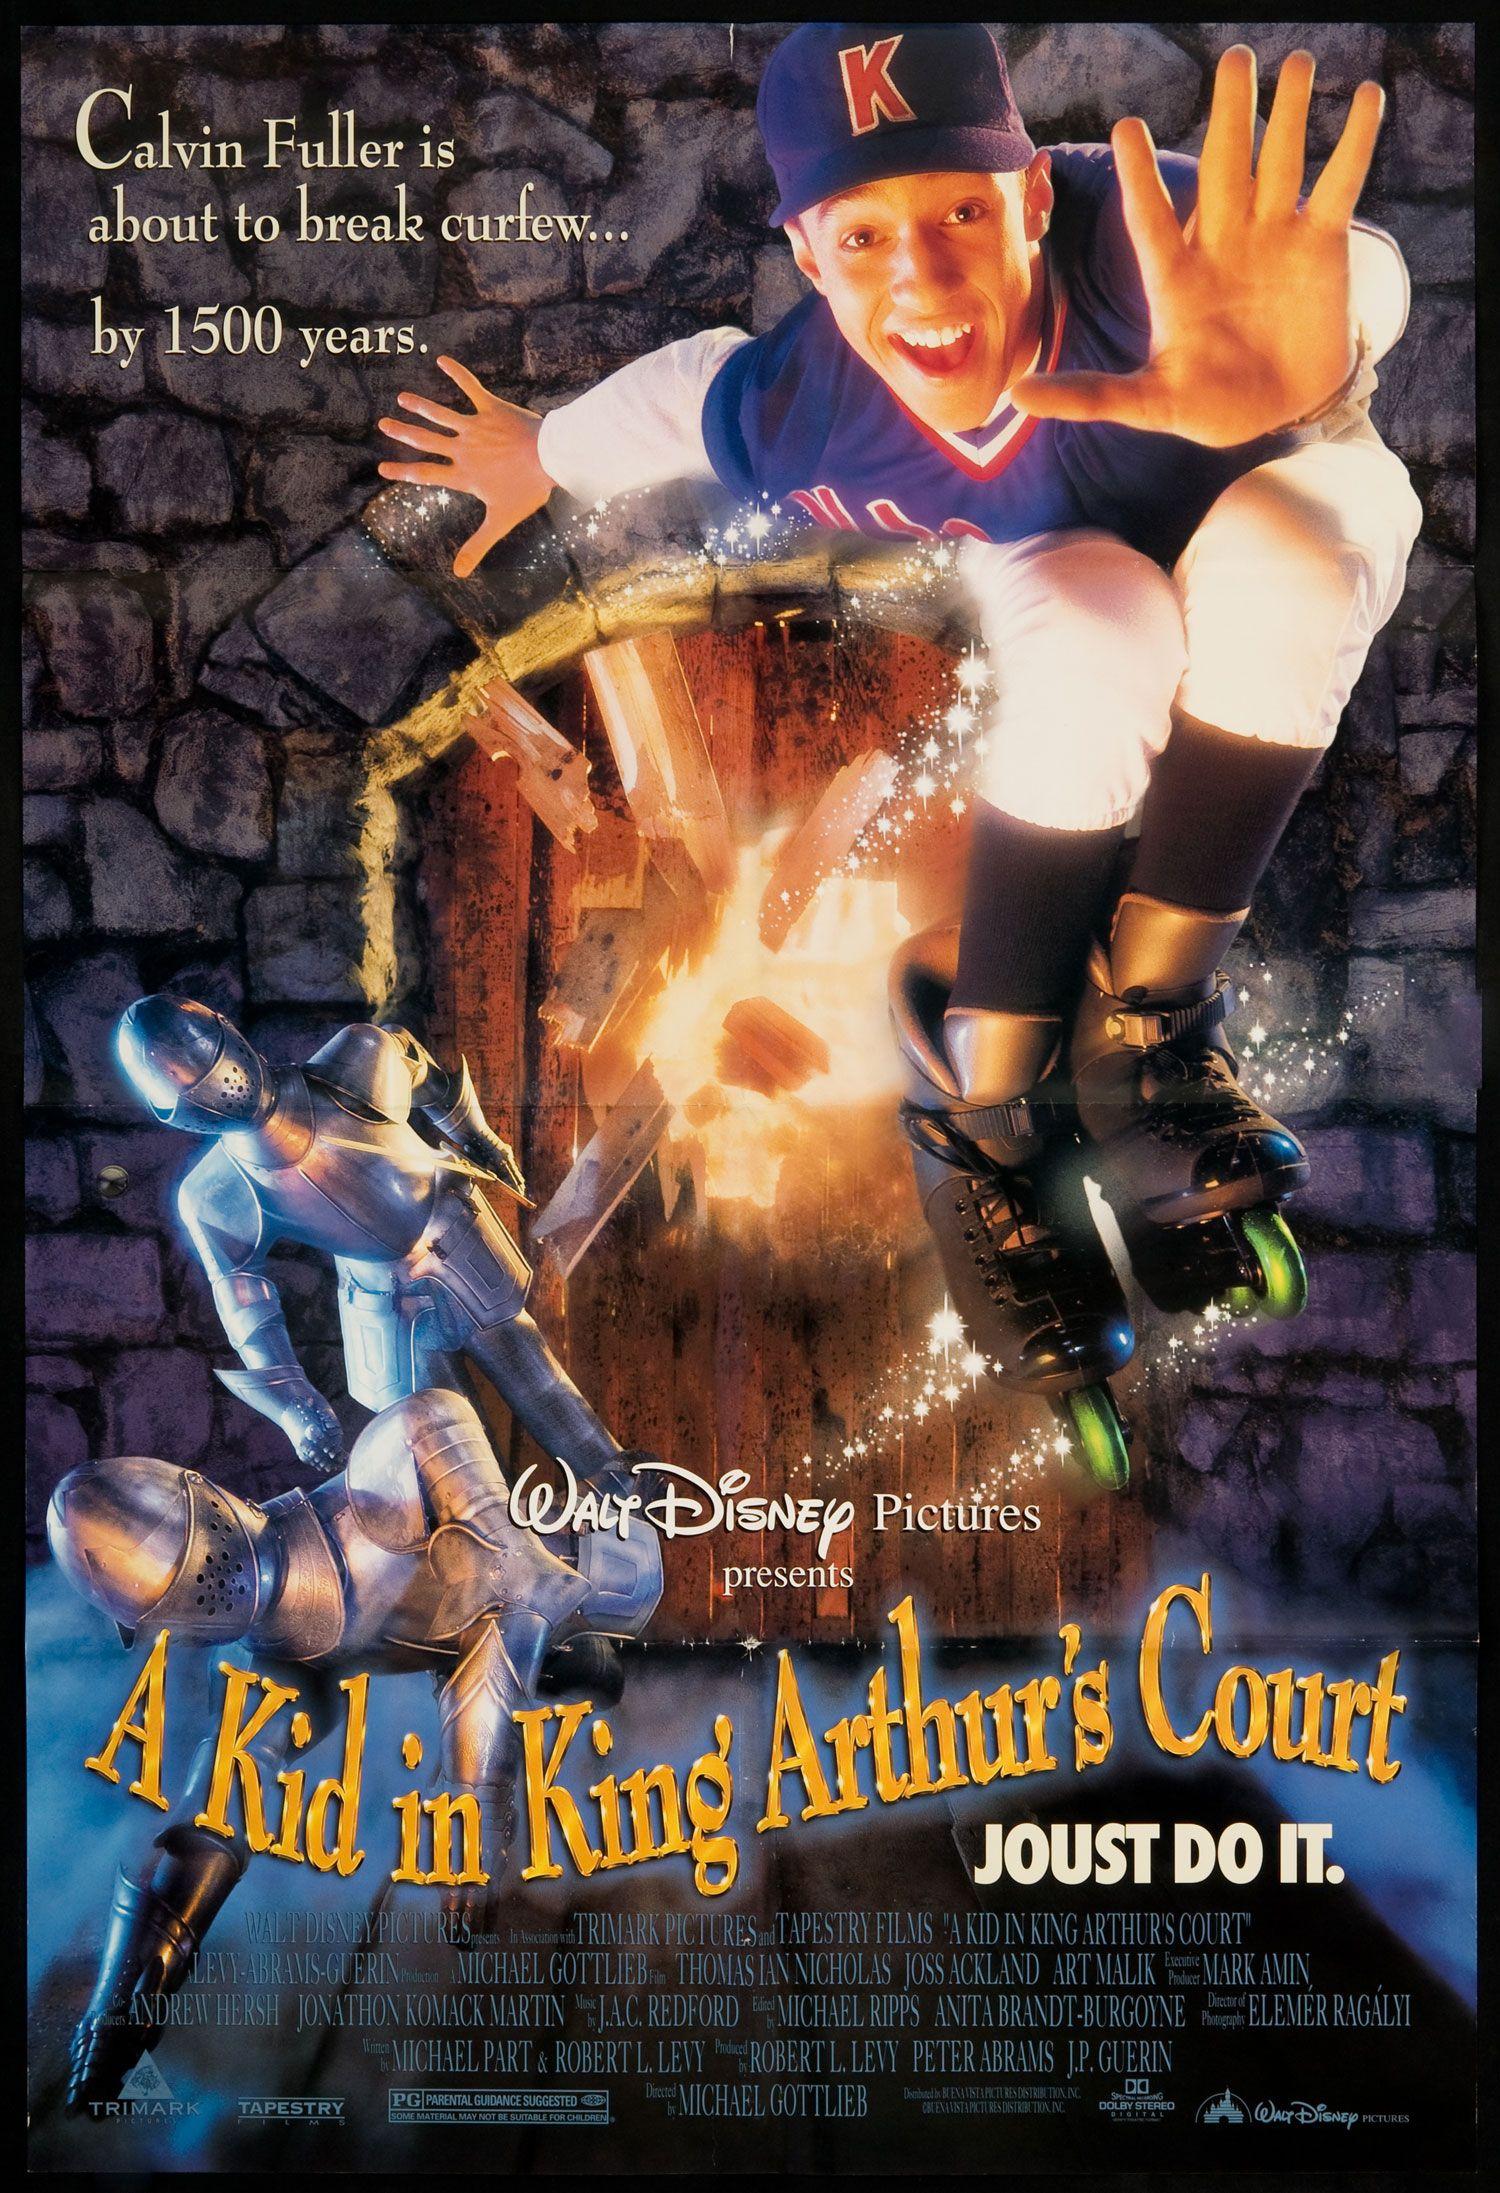 Affiche Poster kid visiteur roi Kid King Arthur Court disney